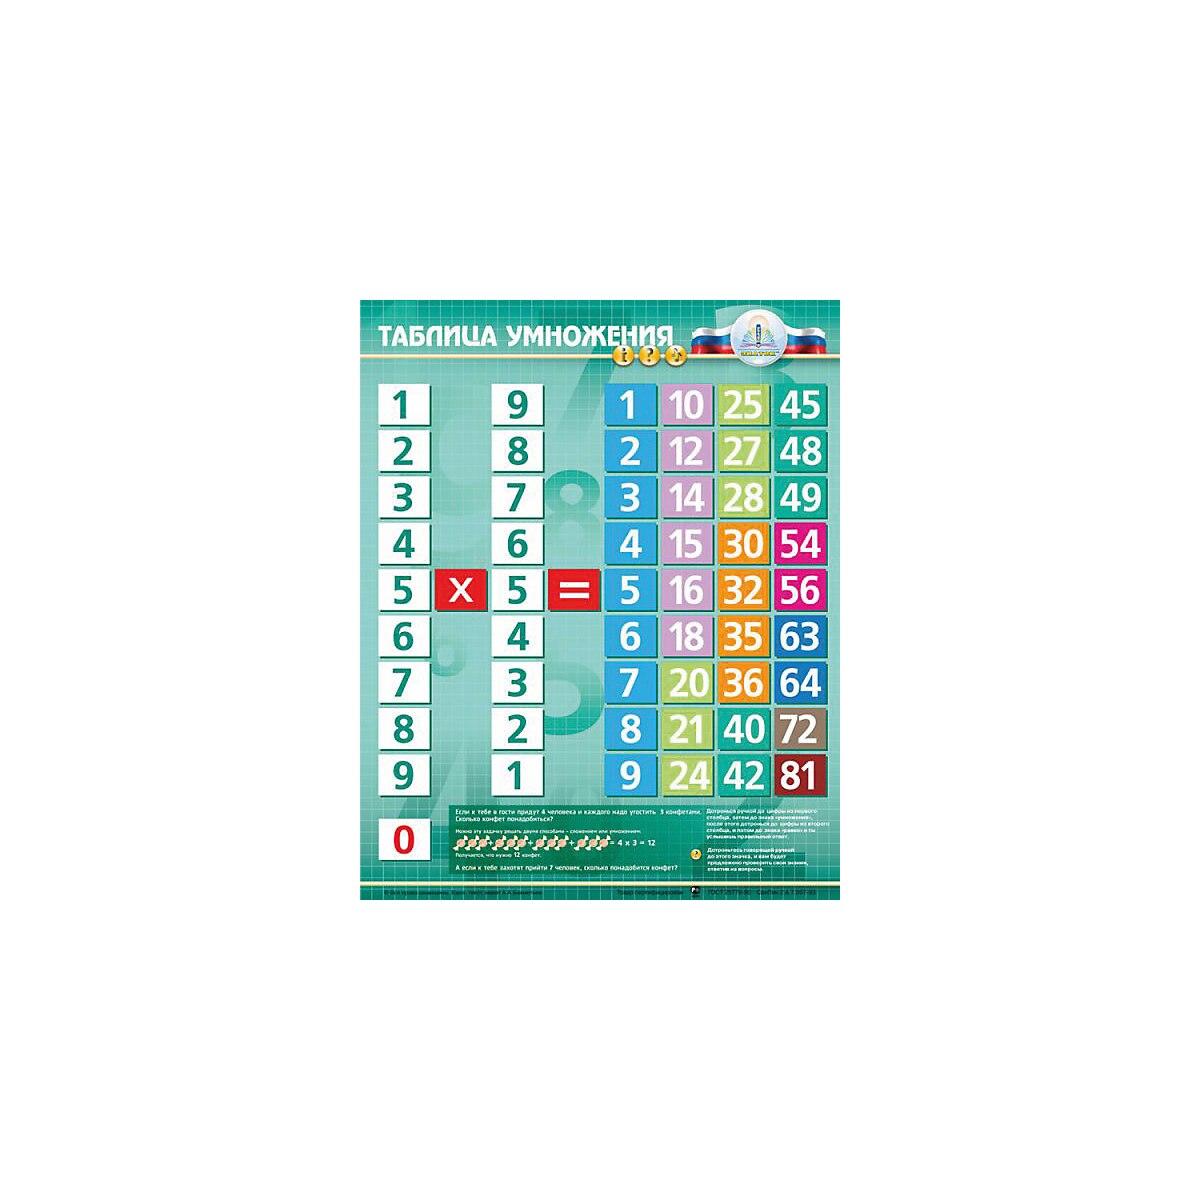 ZNATOK Learning Machine 2403144 educational game interactive toys children toy MTpromo